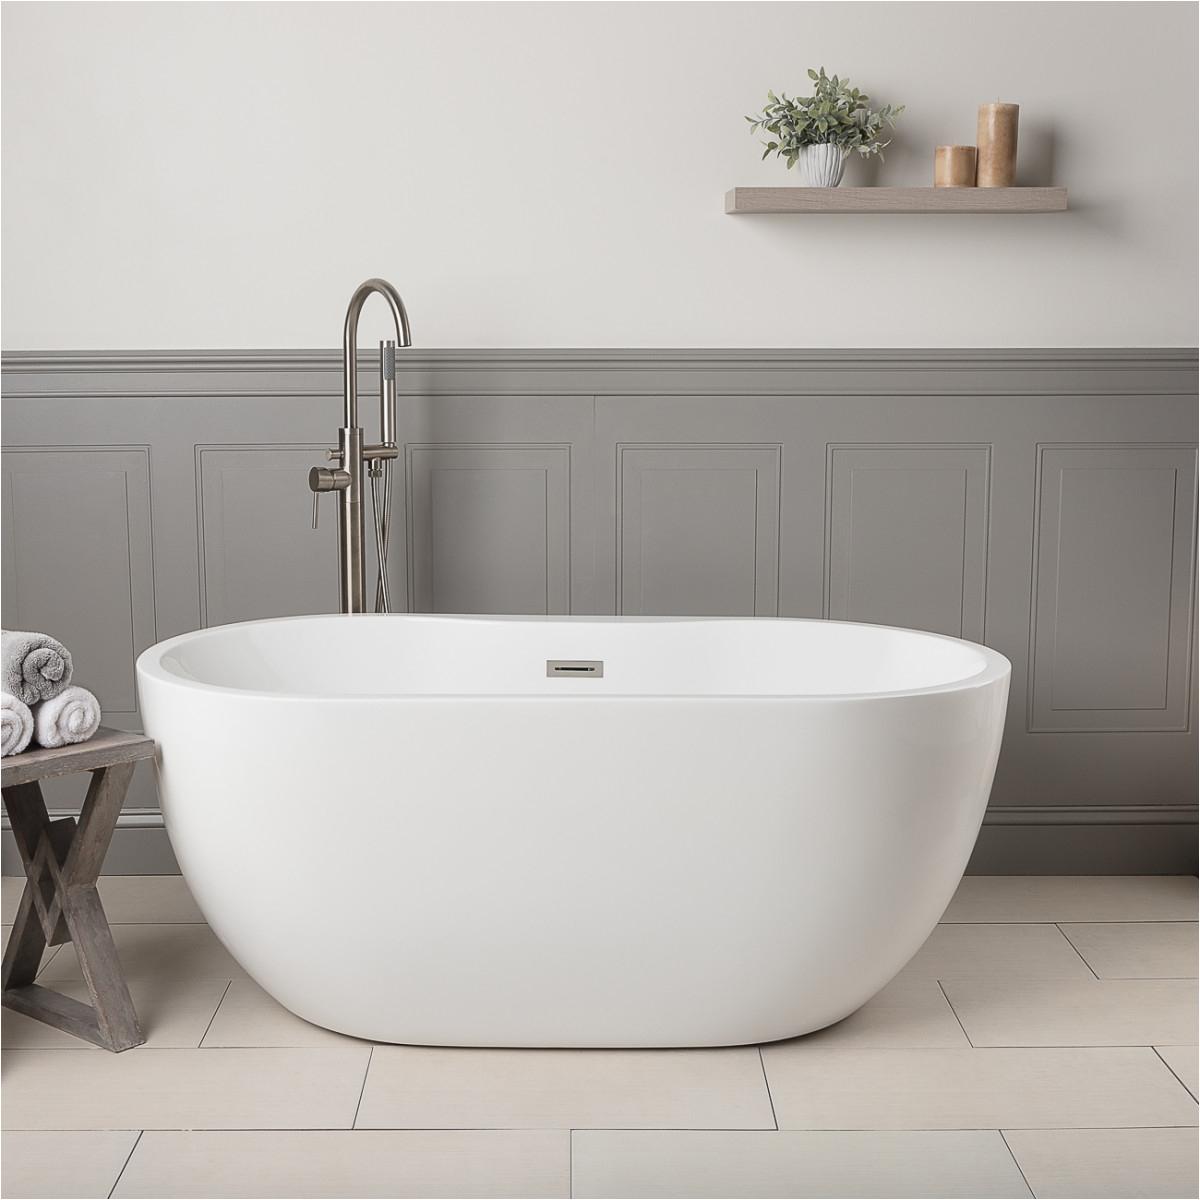 randolph morris acrylic double ended freestanding tub no faucet drillings rma hudson